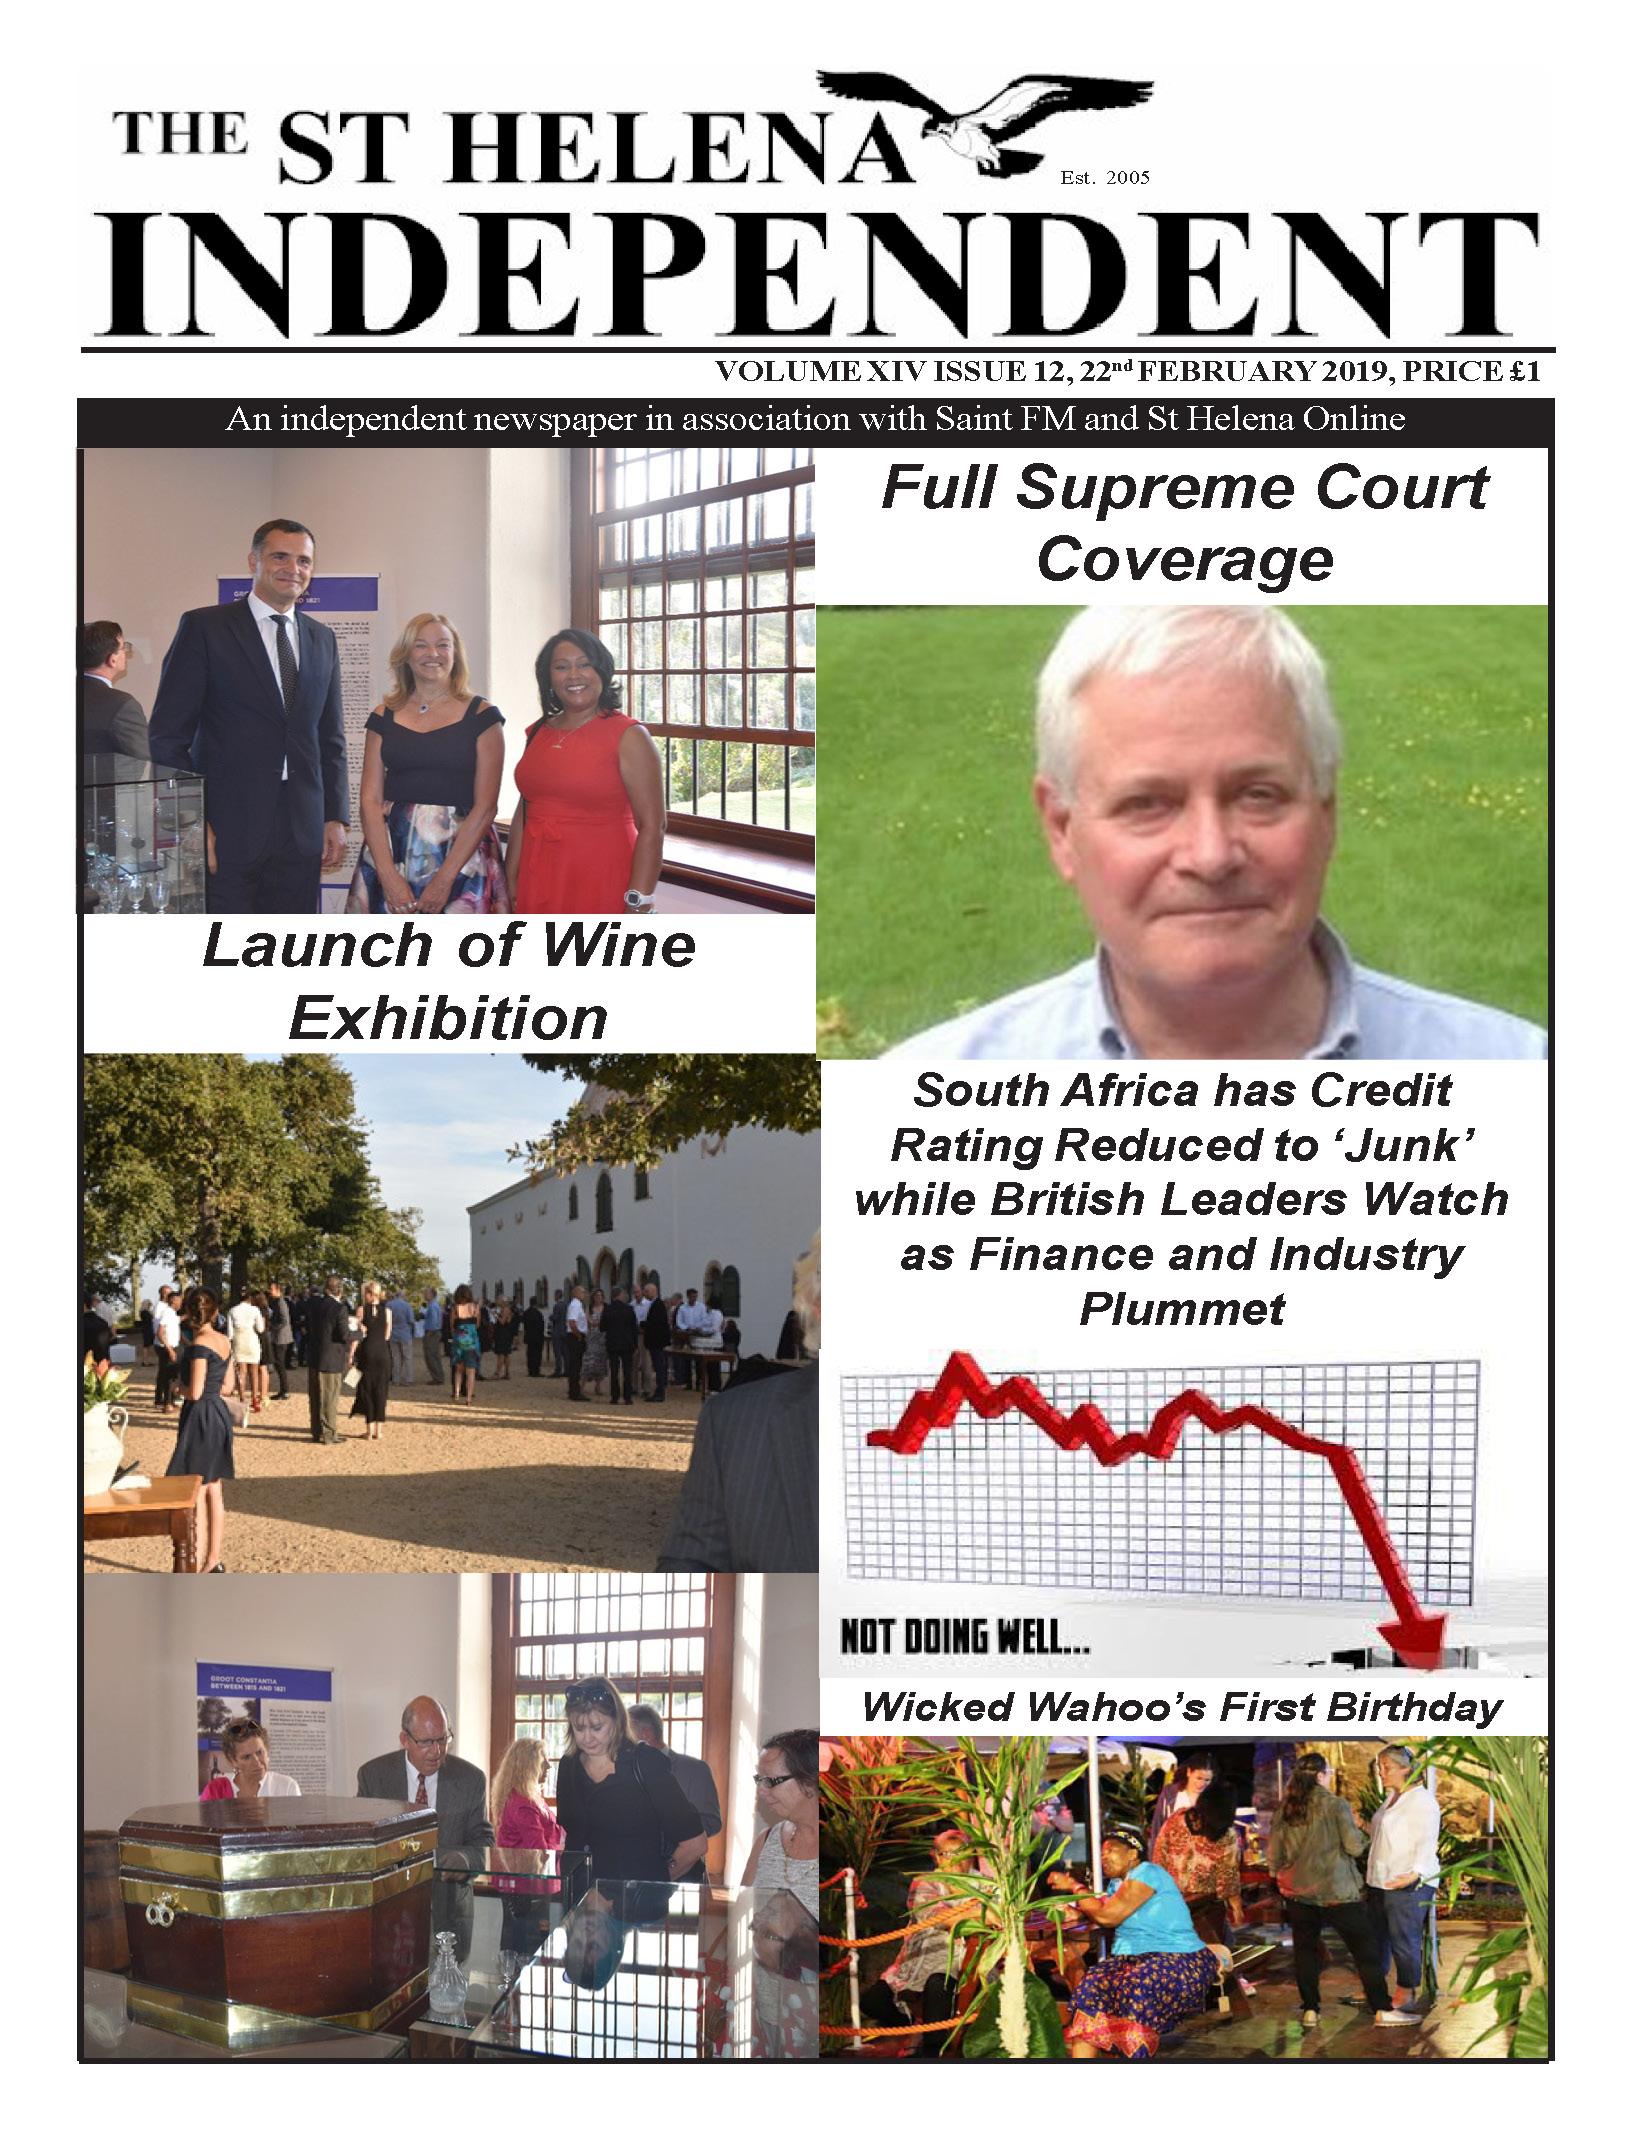 St Helena Independent 20190222